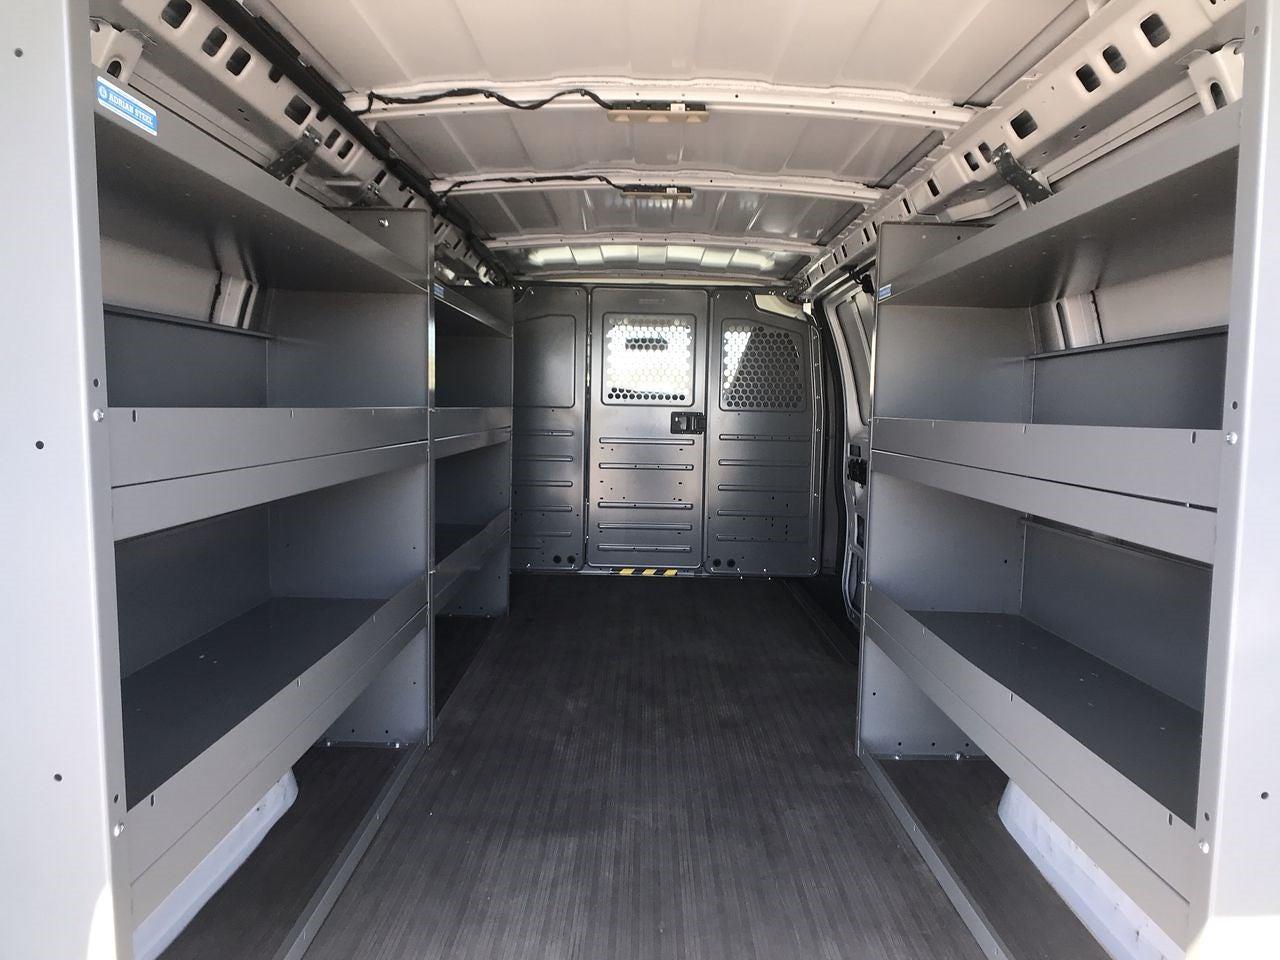 2020 Chevrolet Express 2500 4x2, Upfitted Cargo Van #111613 - photo 1